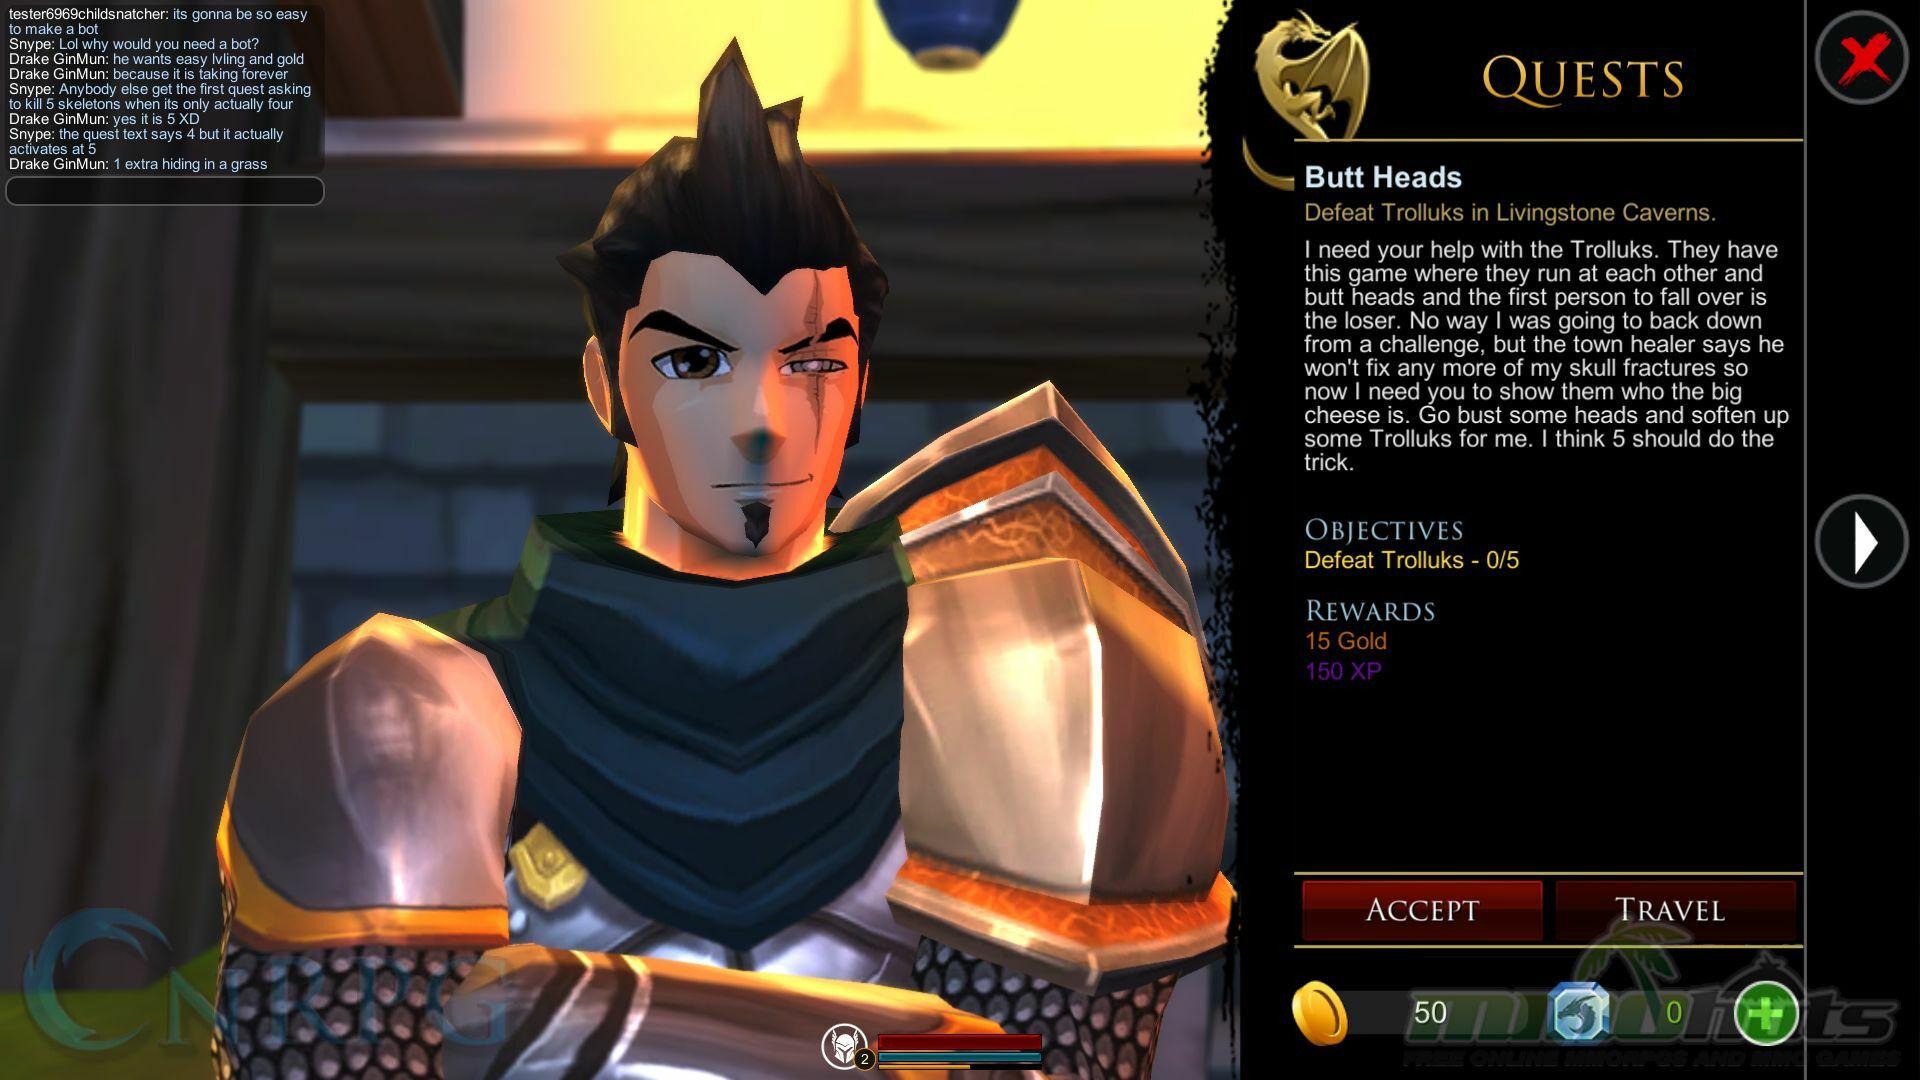 Adventure Quest 3D Open Beta Initial Review